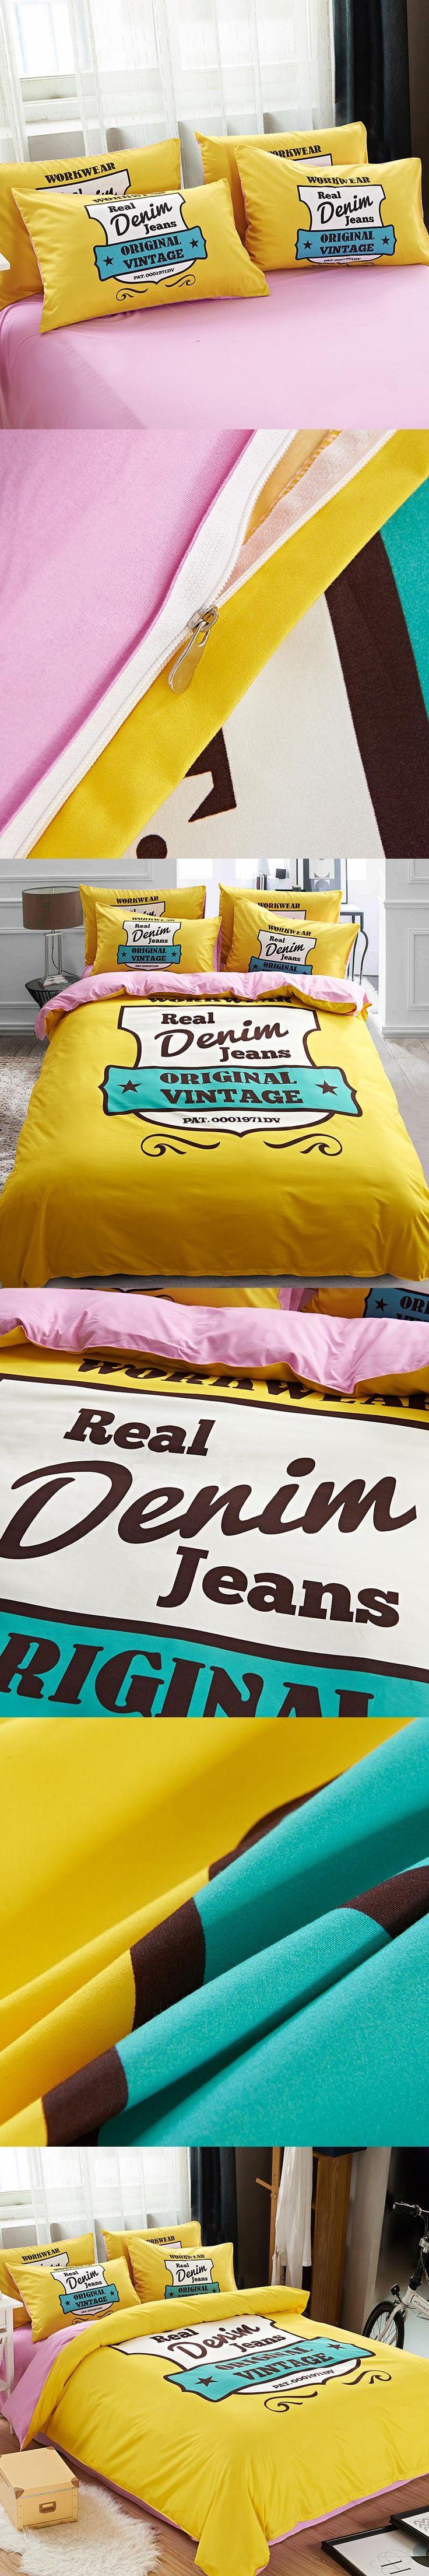 Simple Cotton Bedding Set Lemon yellow Bed Set duvet cover and sheet 4pcs Home Breathable Smooth  bedding sets 4-Pcs